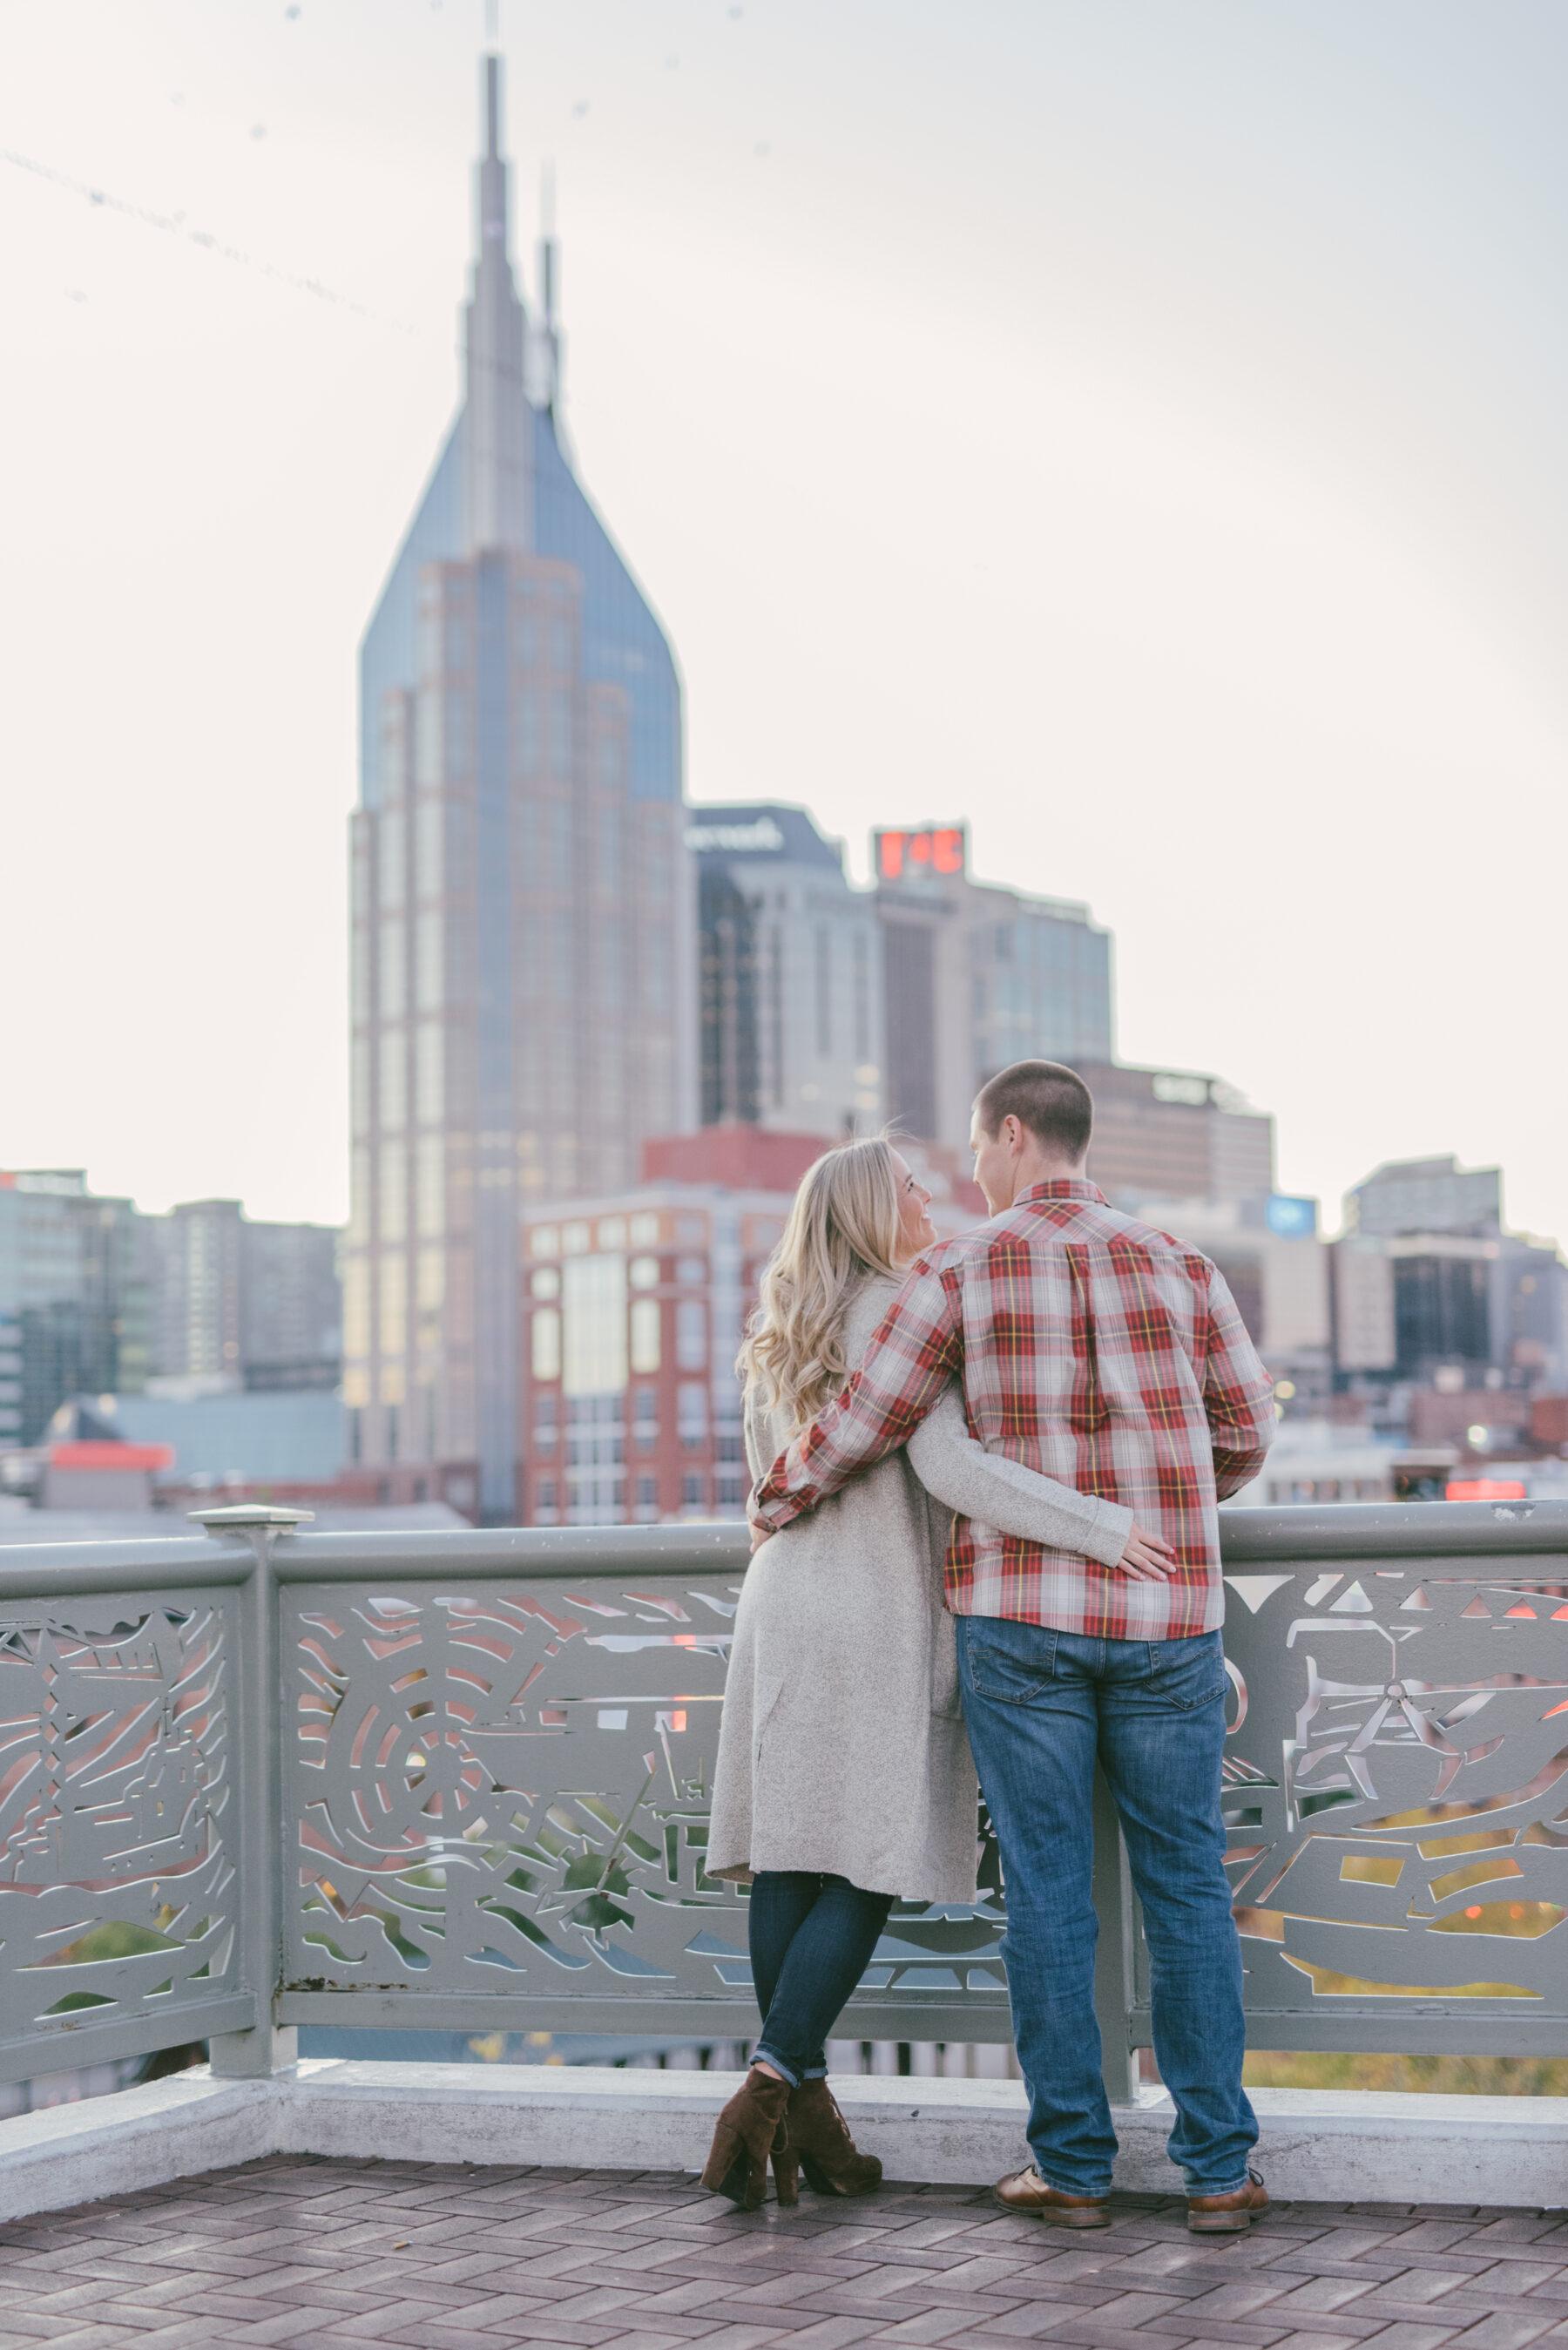 Downtown Nashville Engagement Session captured by Kera Photography   Nashville Bride Guide